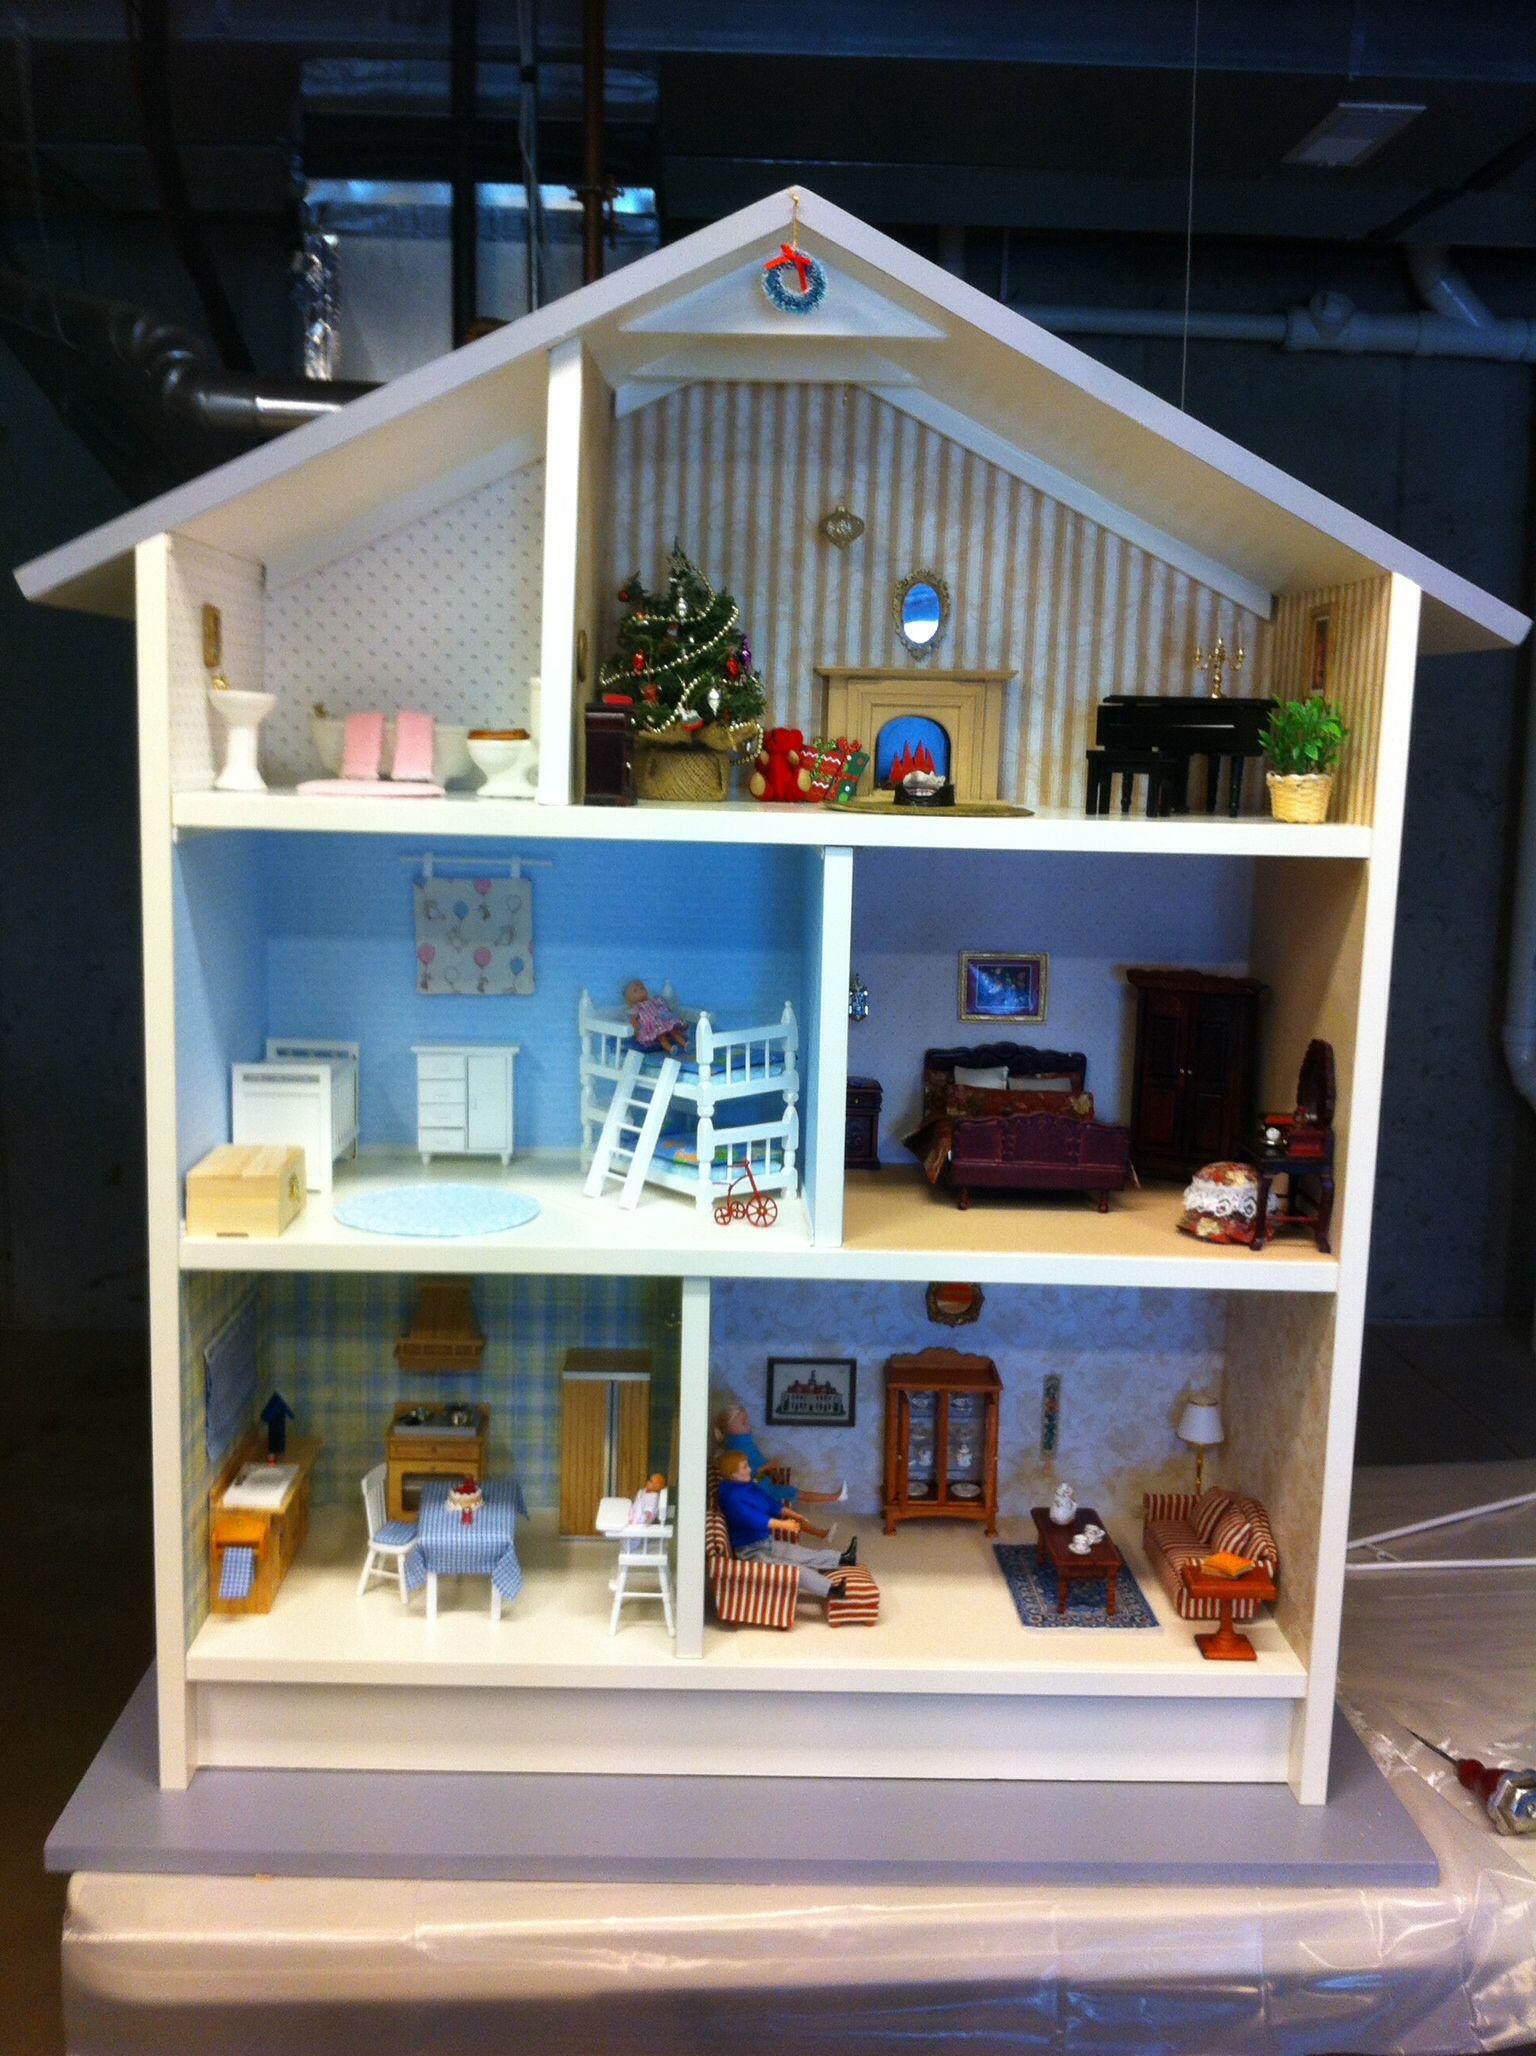 doll house from ikea billy bookcase puppen kinderzimmer spielzeug. Black Bedroom Furniture Sets. Home Design Ideas